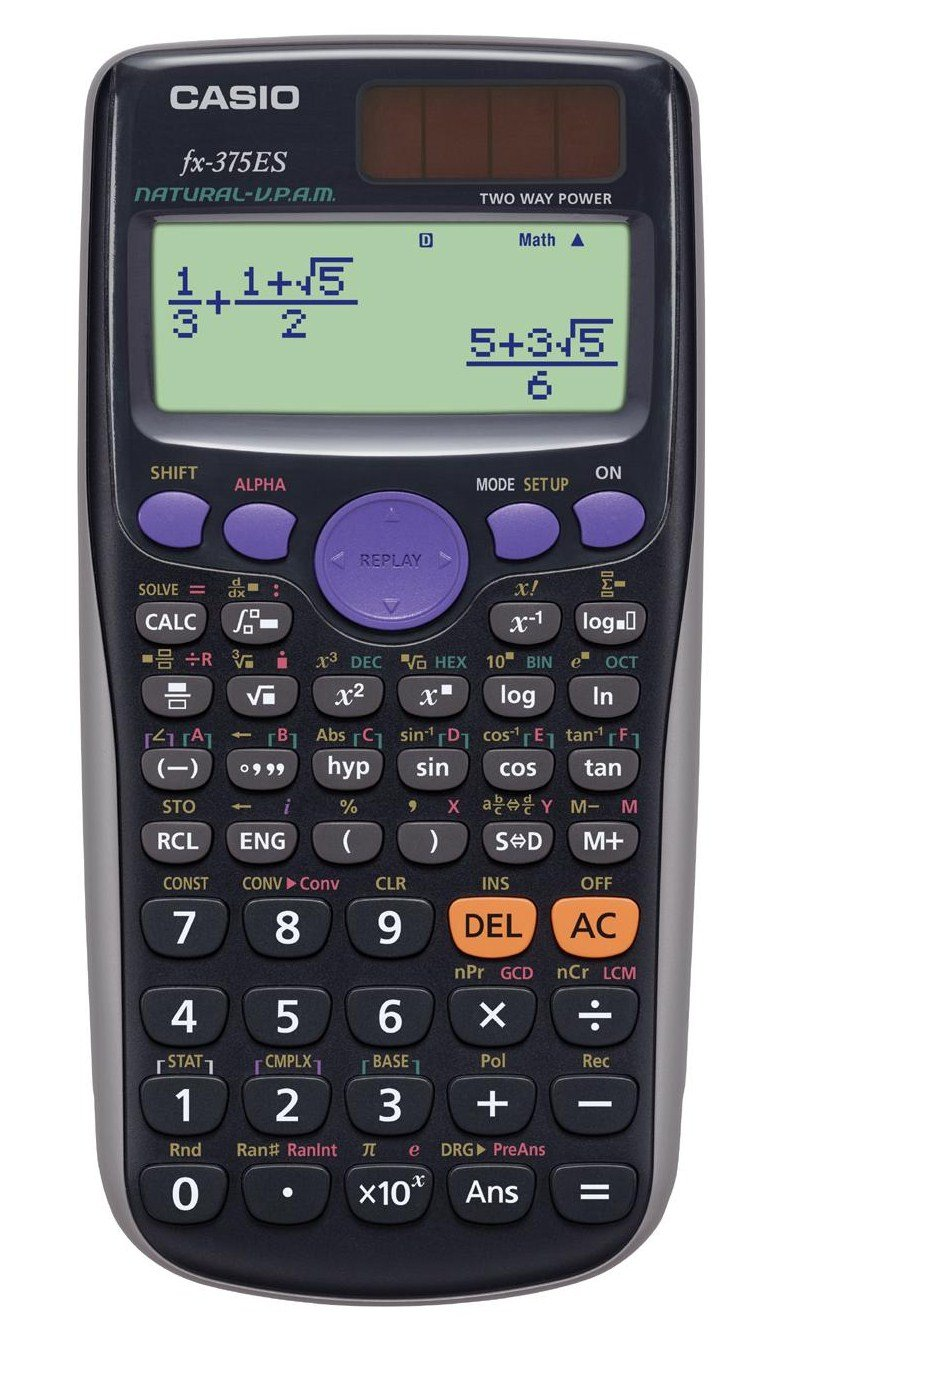 関数電卓 数学自然表示 394関数 10桁 fx-375ES-N ブラック